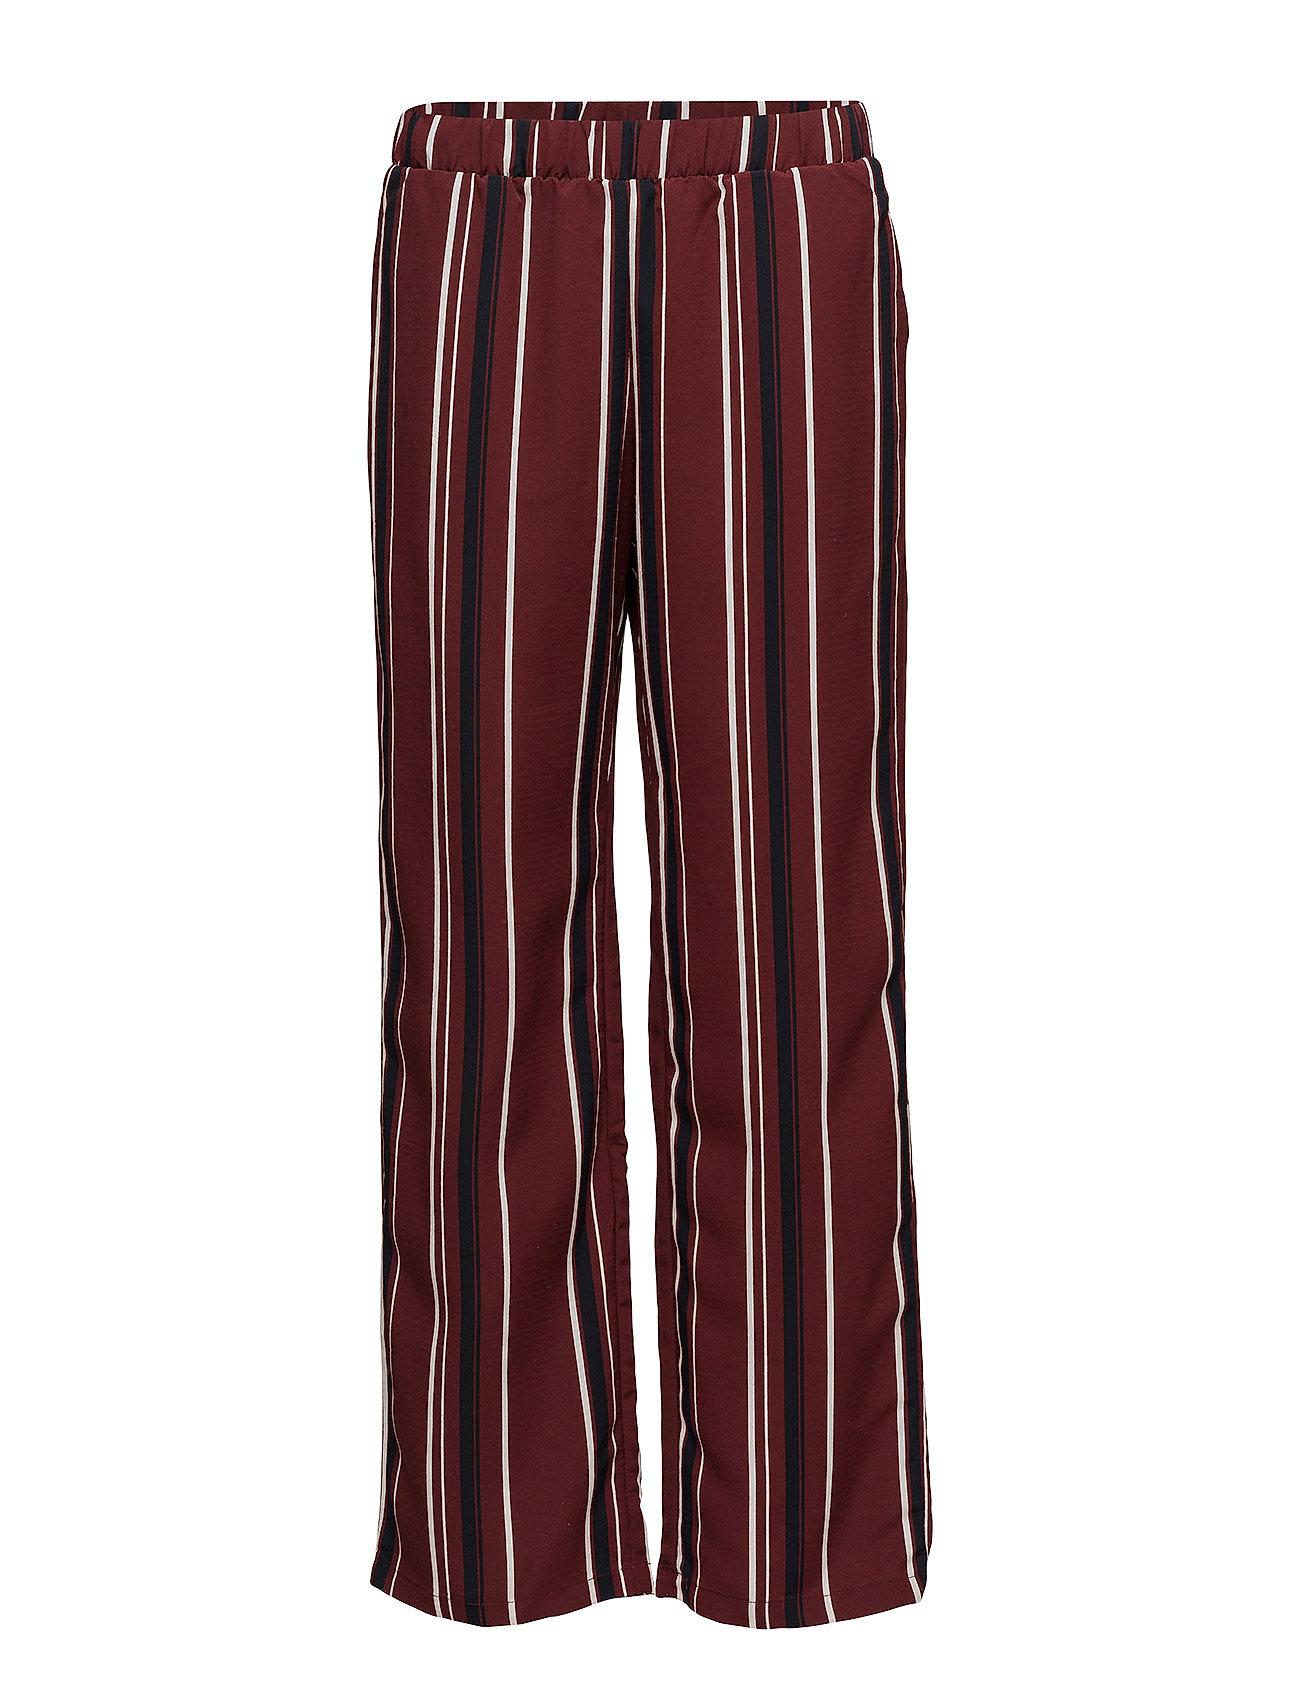 Visesilla Pants/Rx